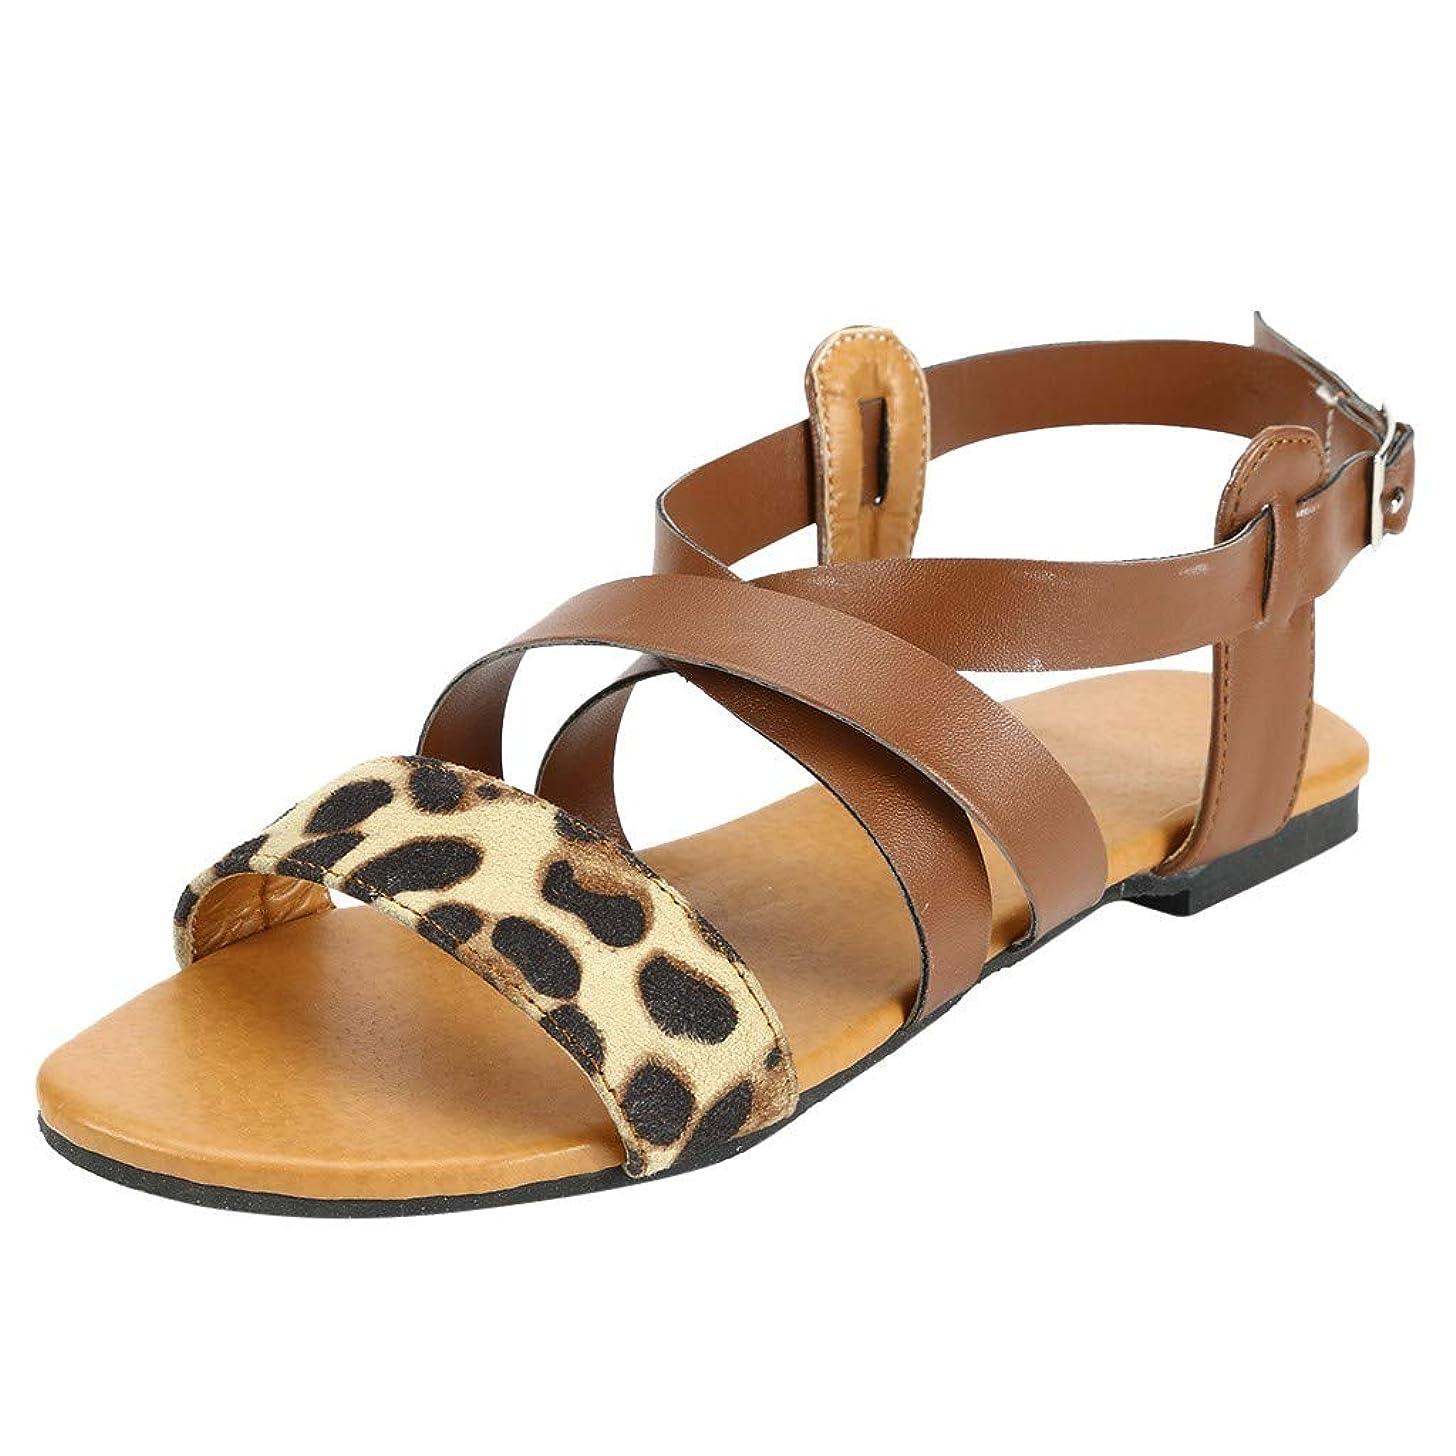 Women's Casual Cross Strap Beach Fashion Leopard Beach Walk Shoes Peep Toe Flat Roma Sandals JHKUNO